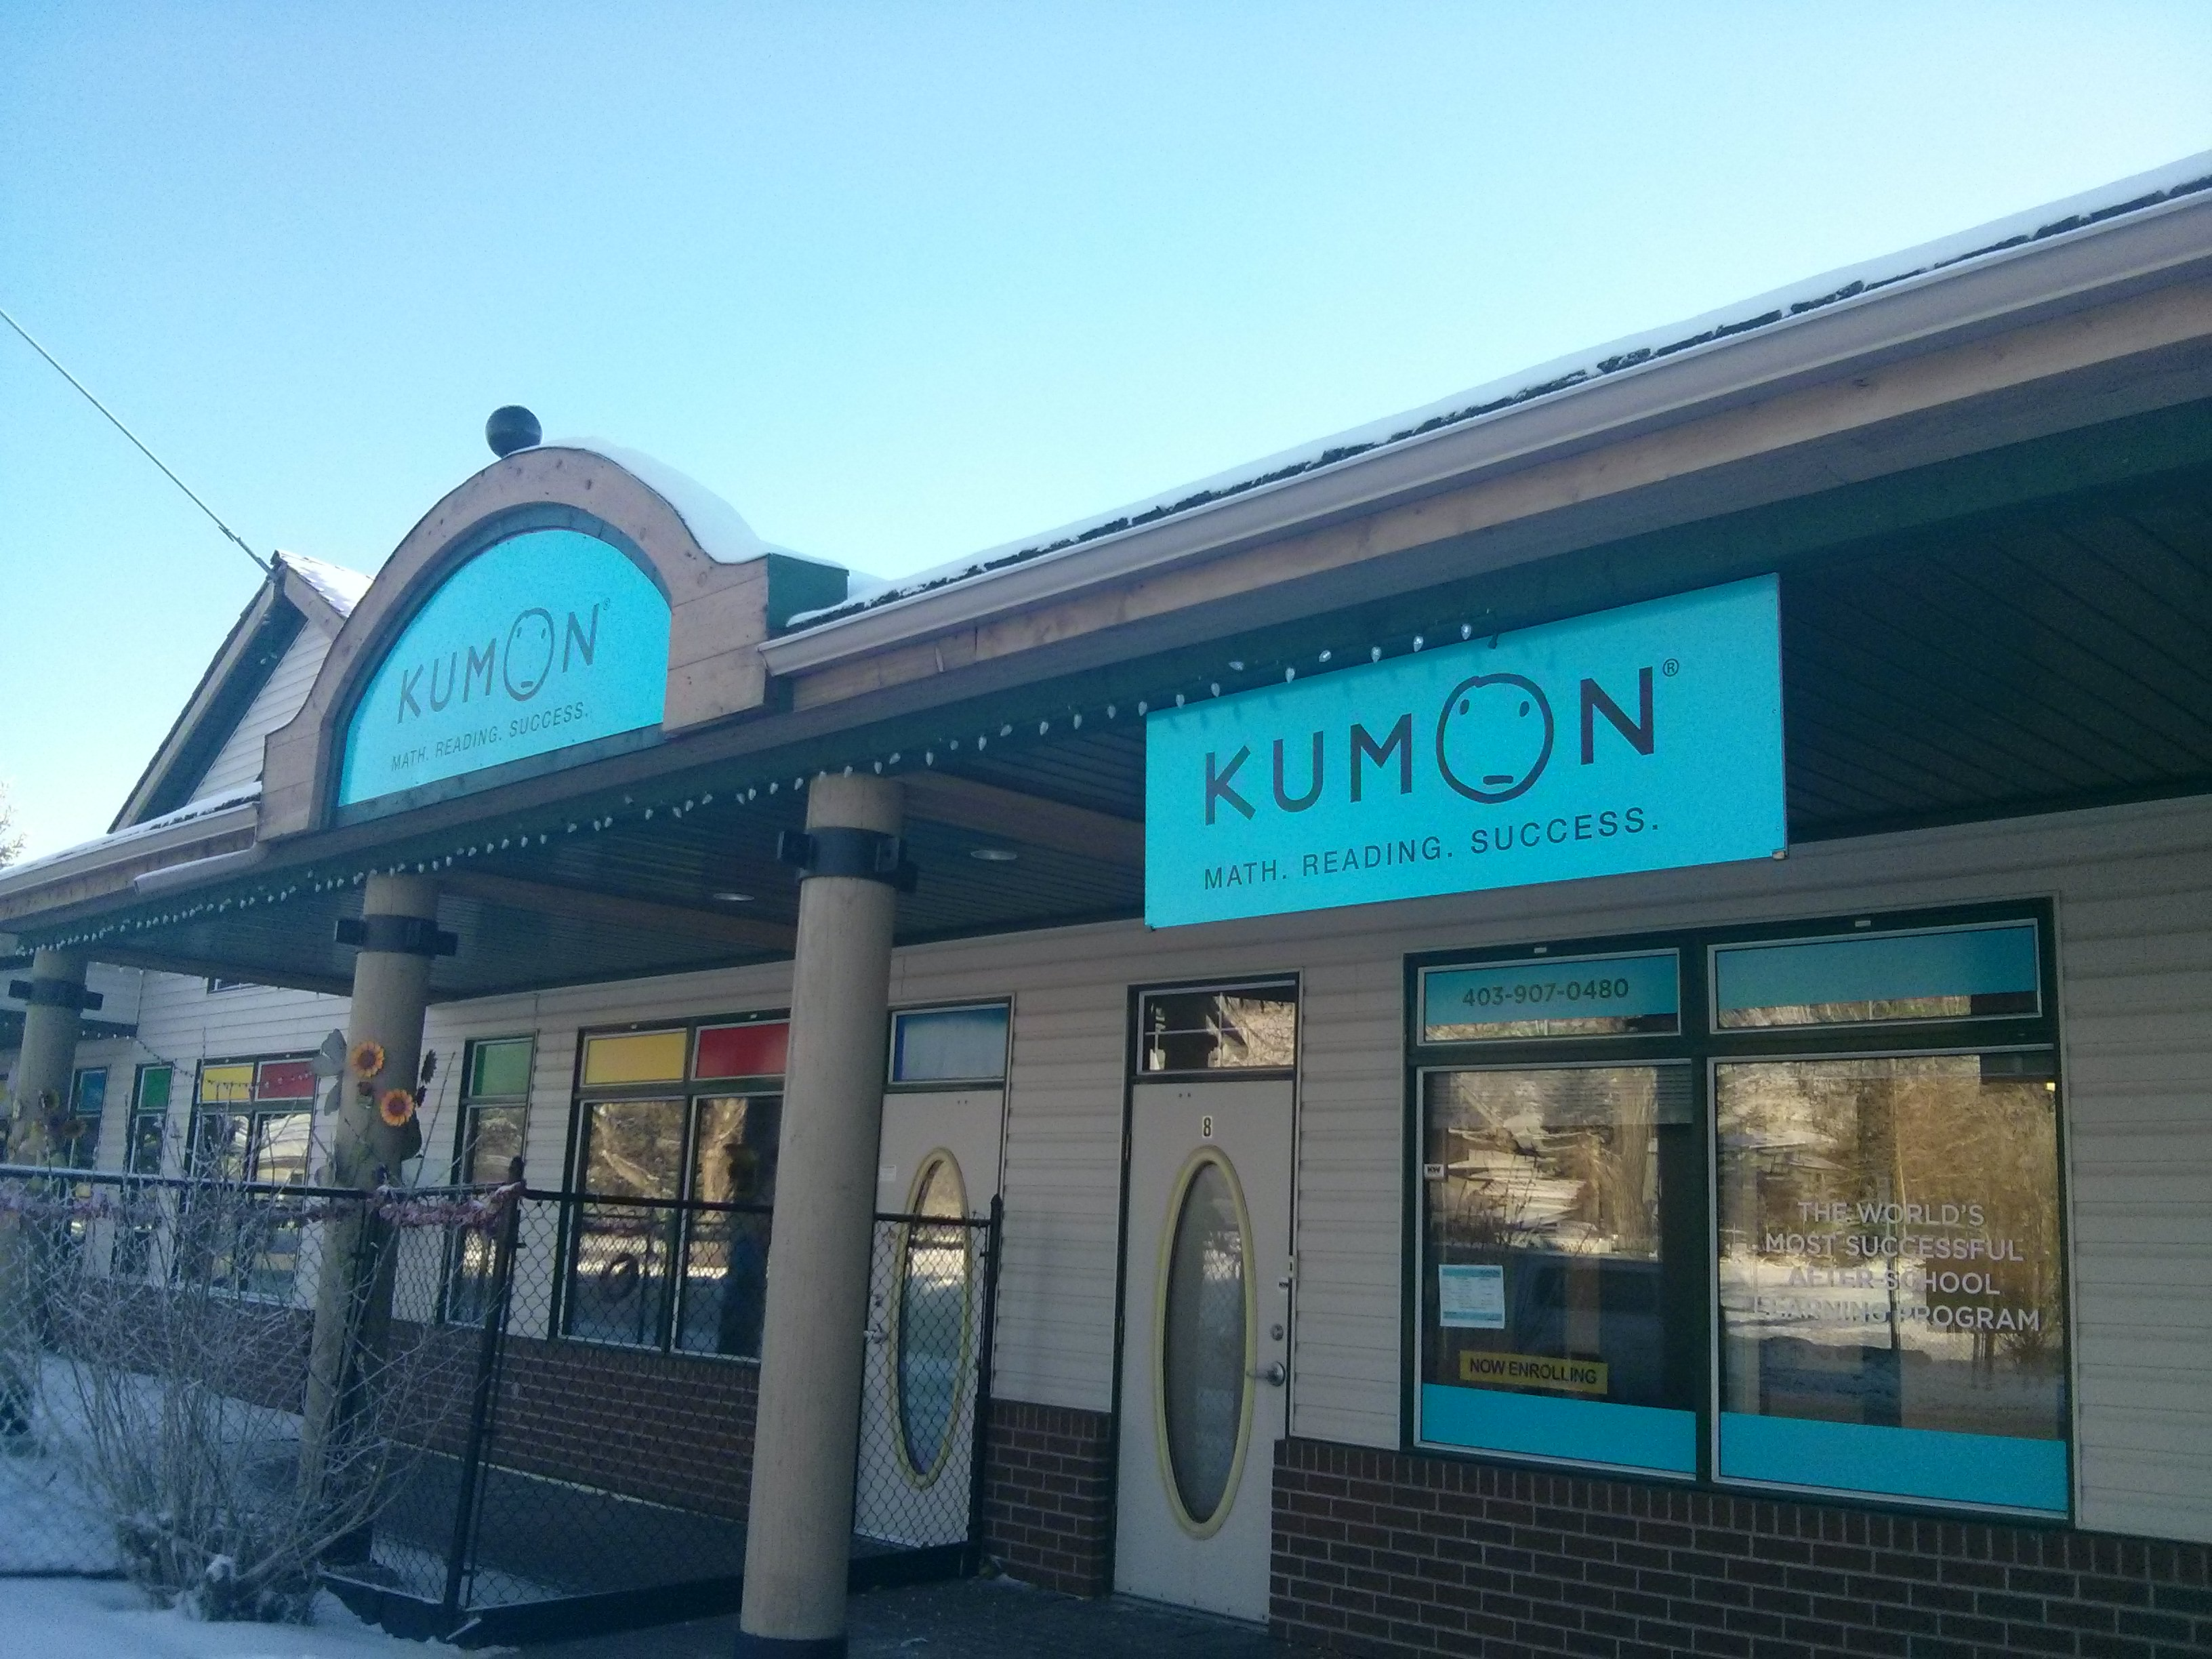 kumon math and reading - Akba.greenw.co